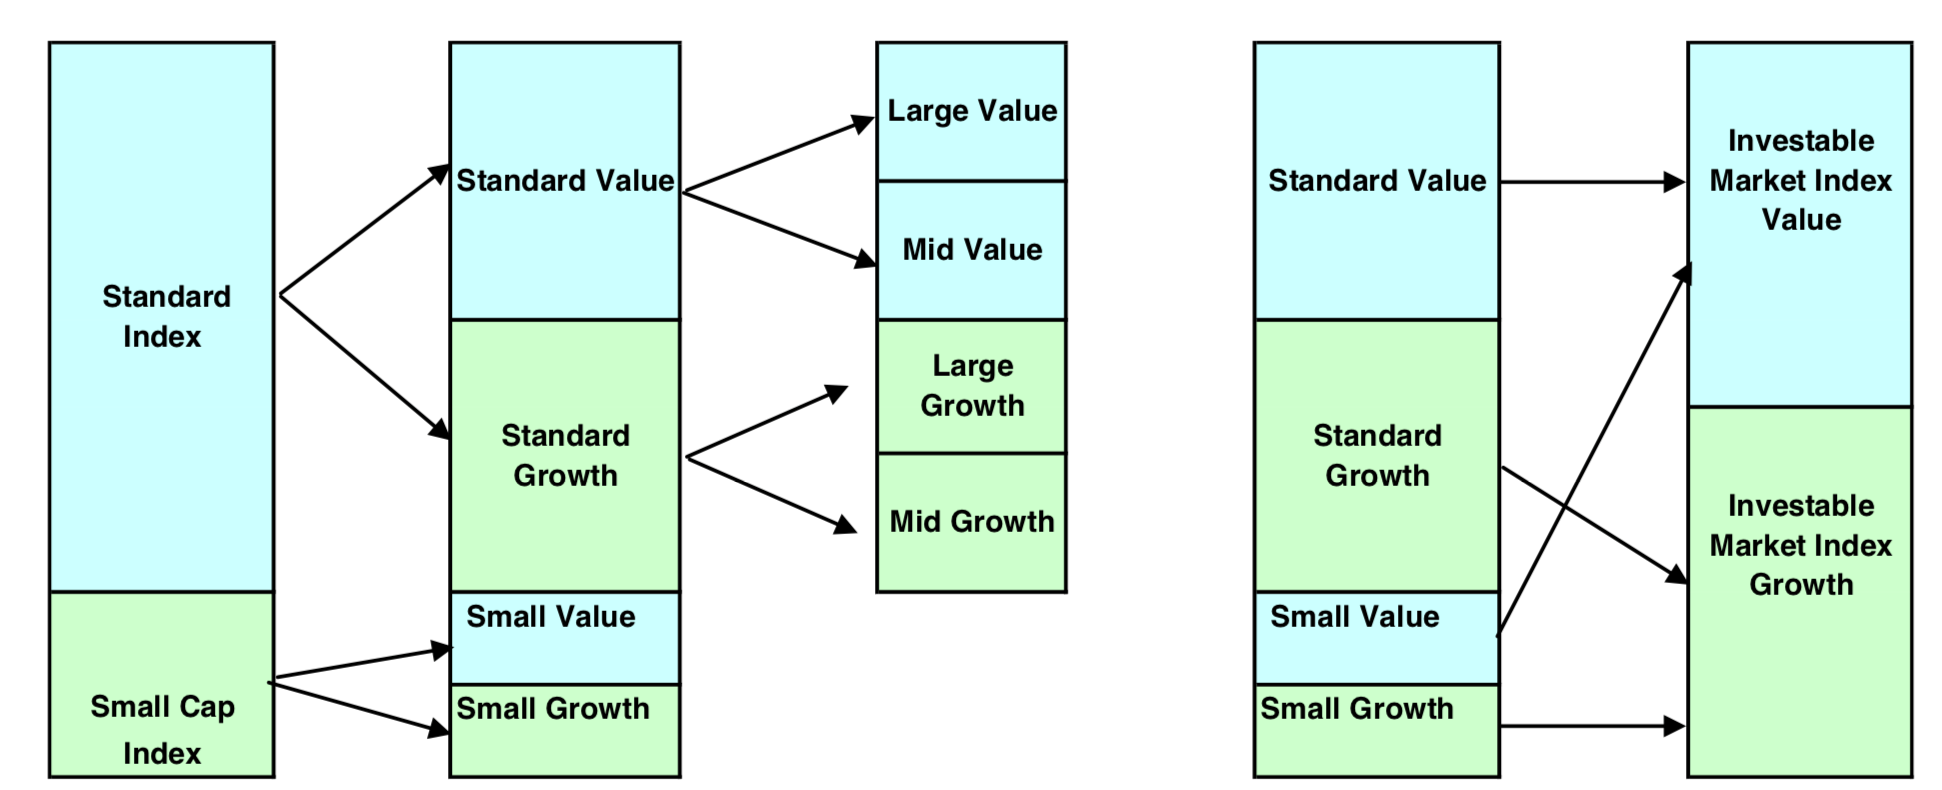 inversion valor